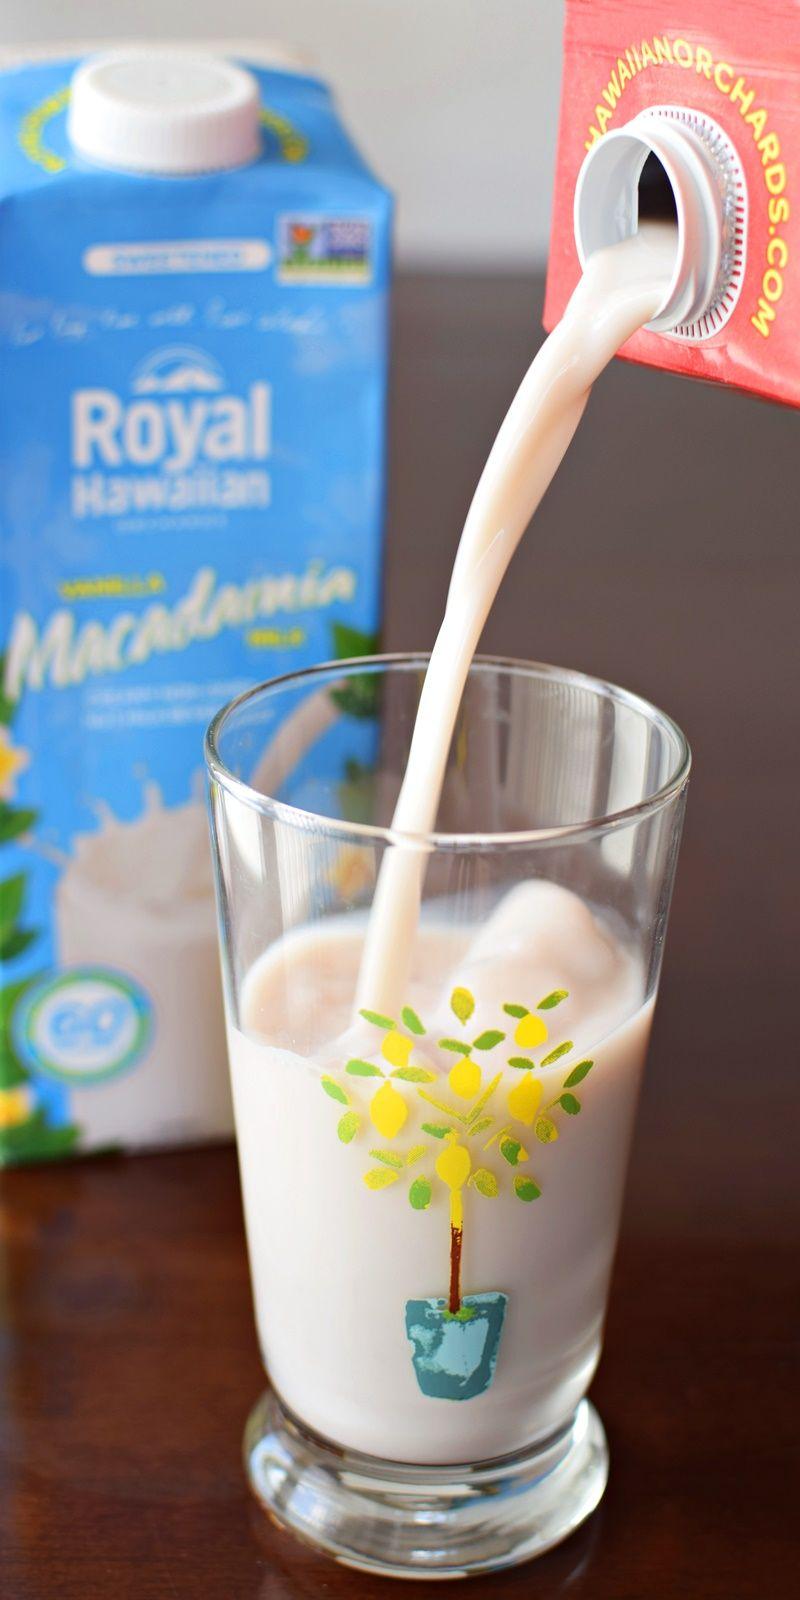 Milkadamia Macadamia Milk Review Information Dairy Free Dairy Free Dairy Free Coffee Dairy Drinks